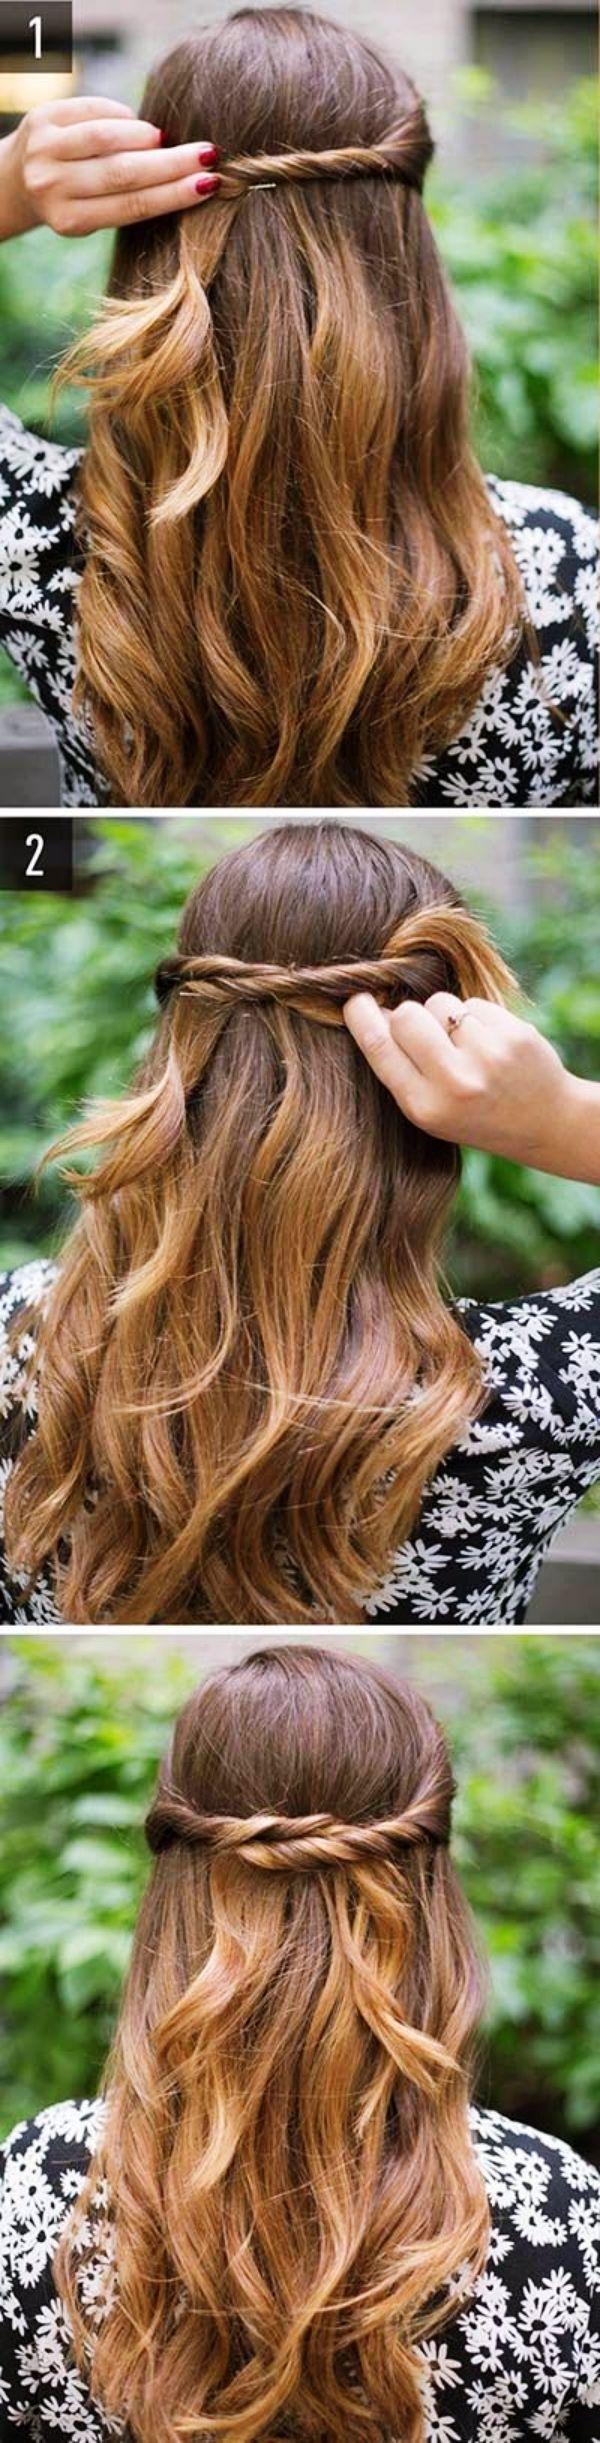 35 Greek Goddess Half-up Half-Down Hairstyles